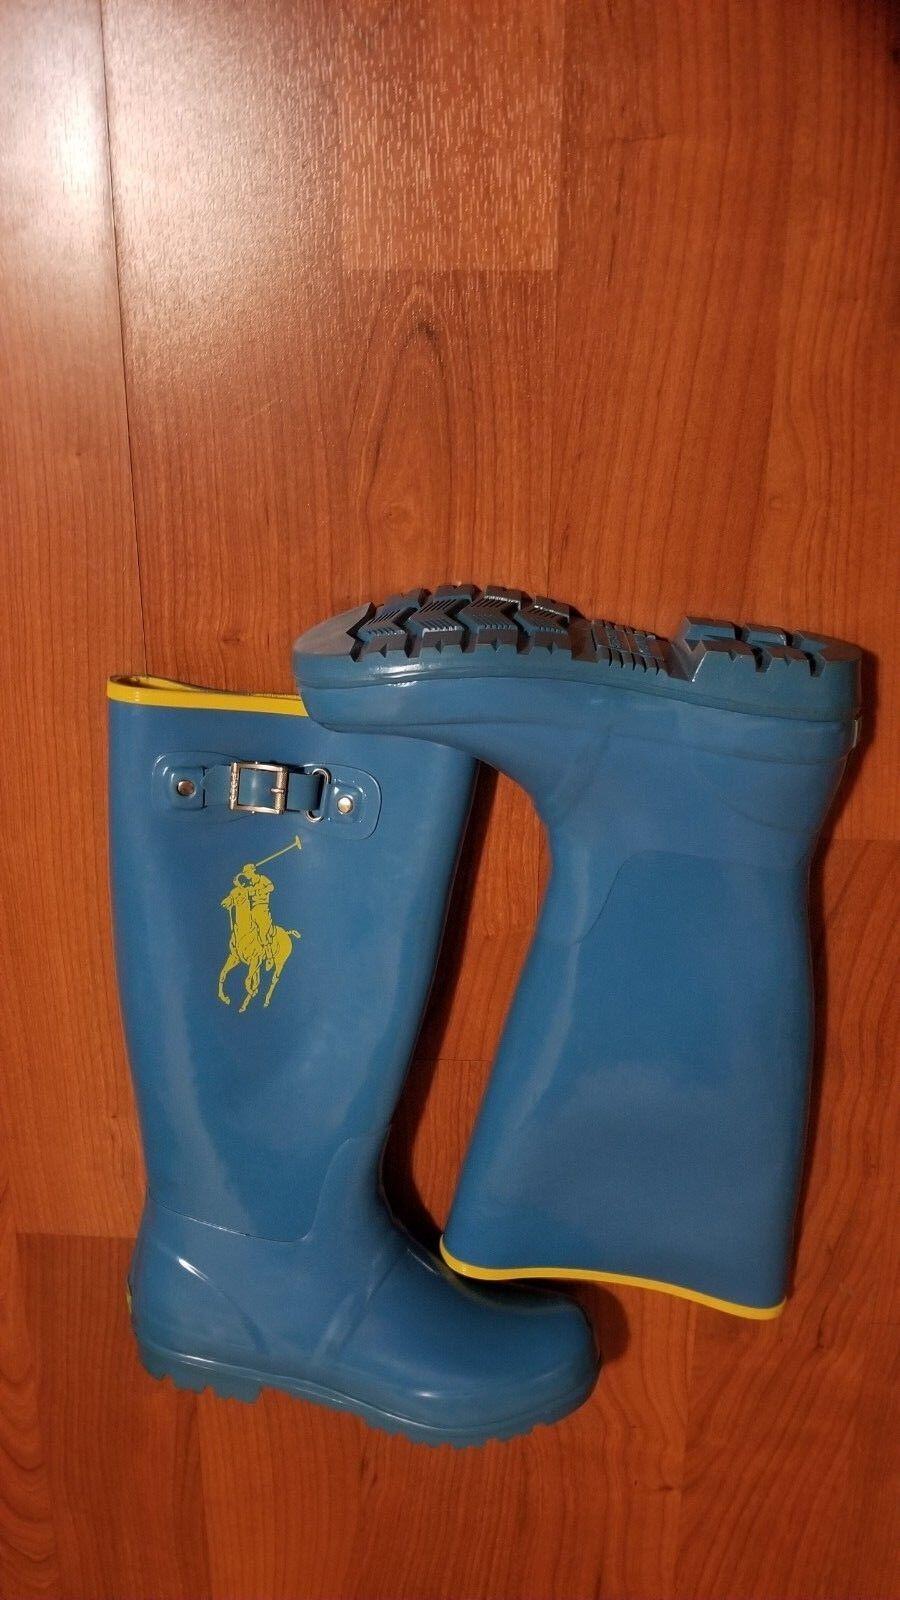 Ralph Lauren Polo Rain Boots Womens Size 6 Blue Yellow Big Pony Shoes